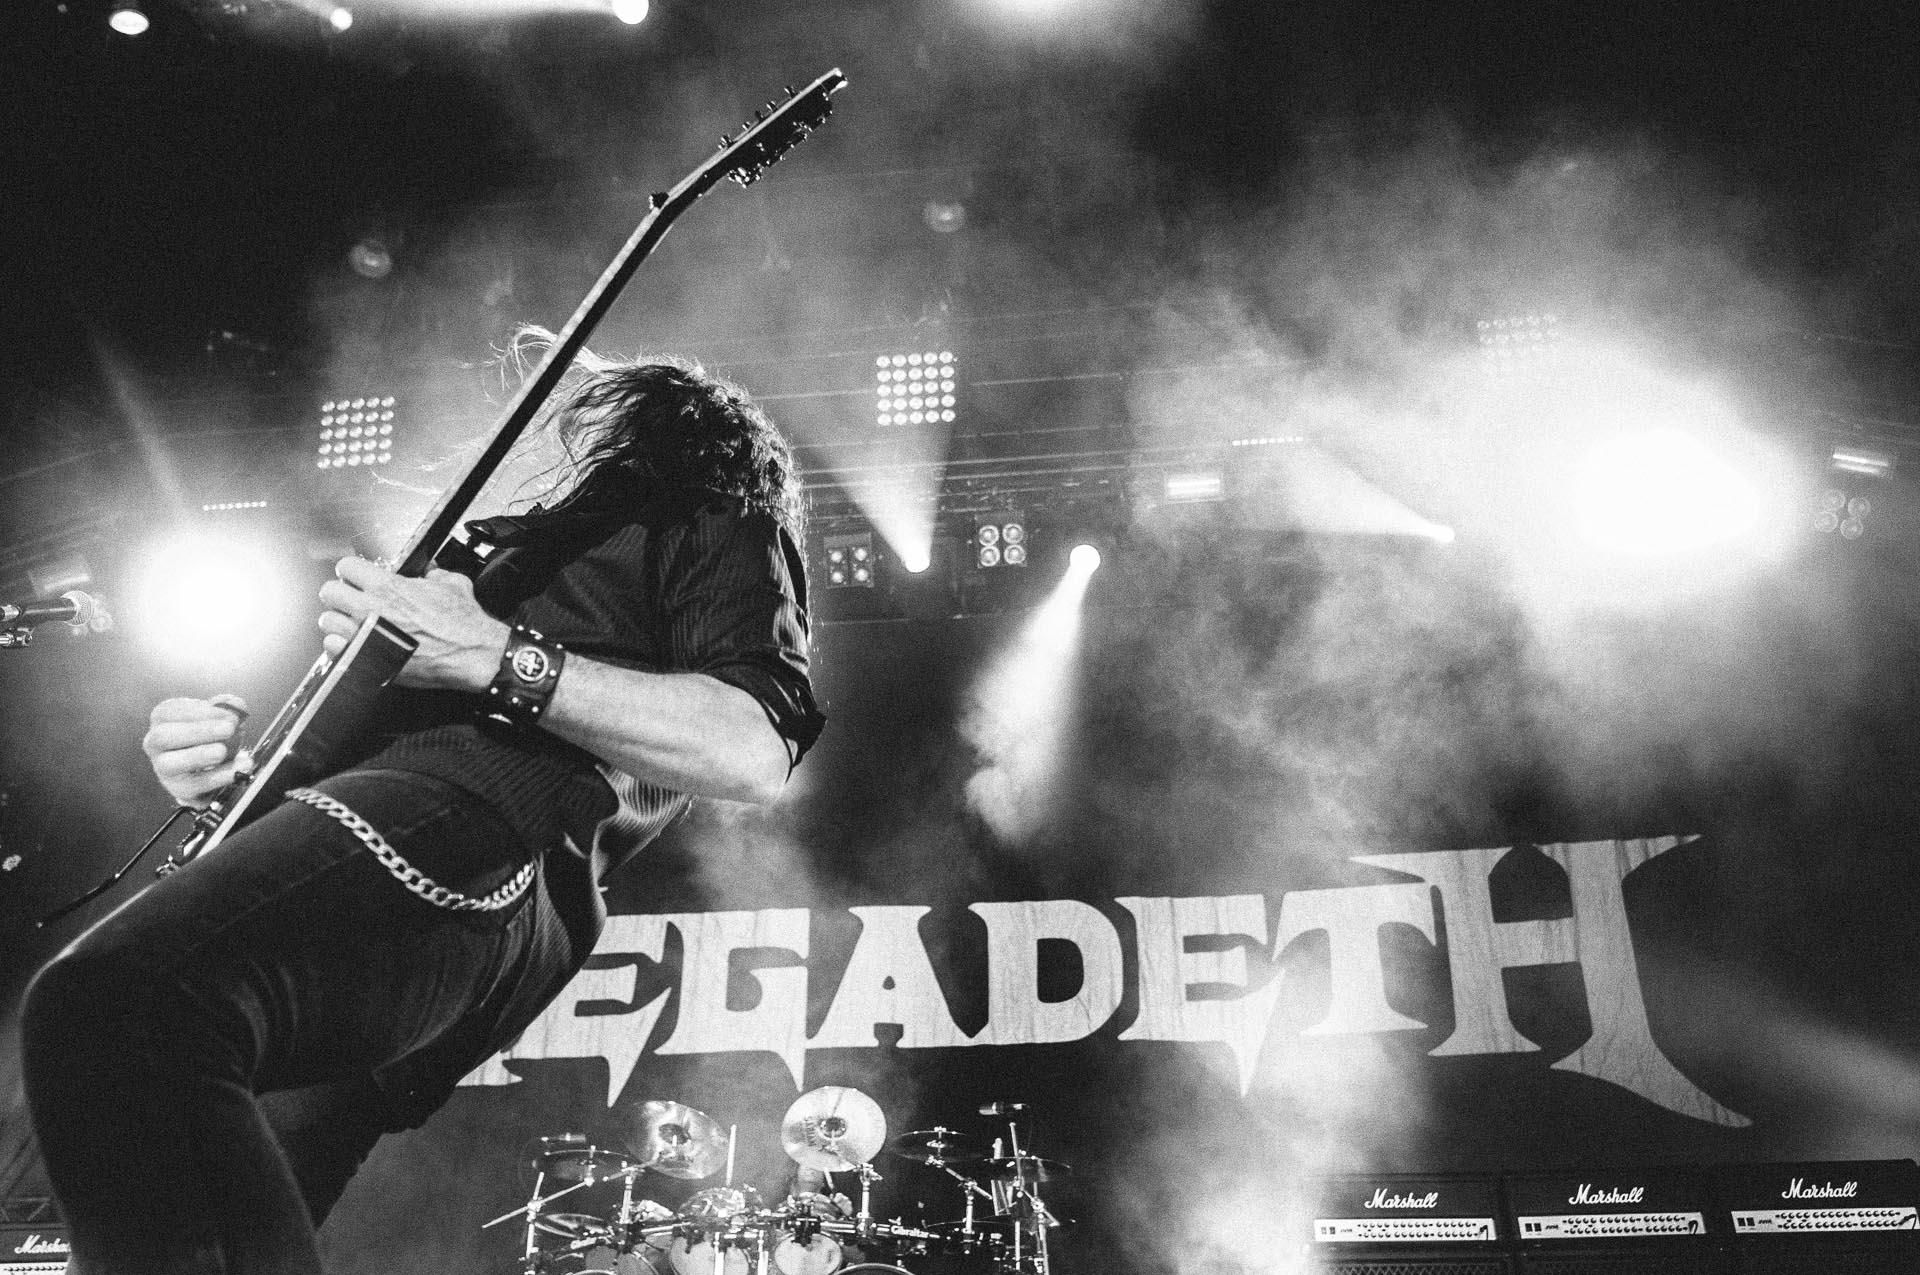 megadeth_x103_mayhem_festival_live_klipsch_music_center_indianapolis-04